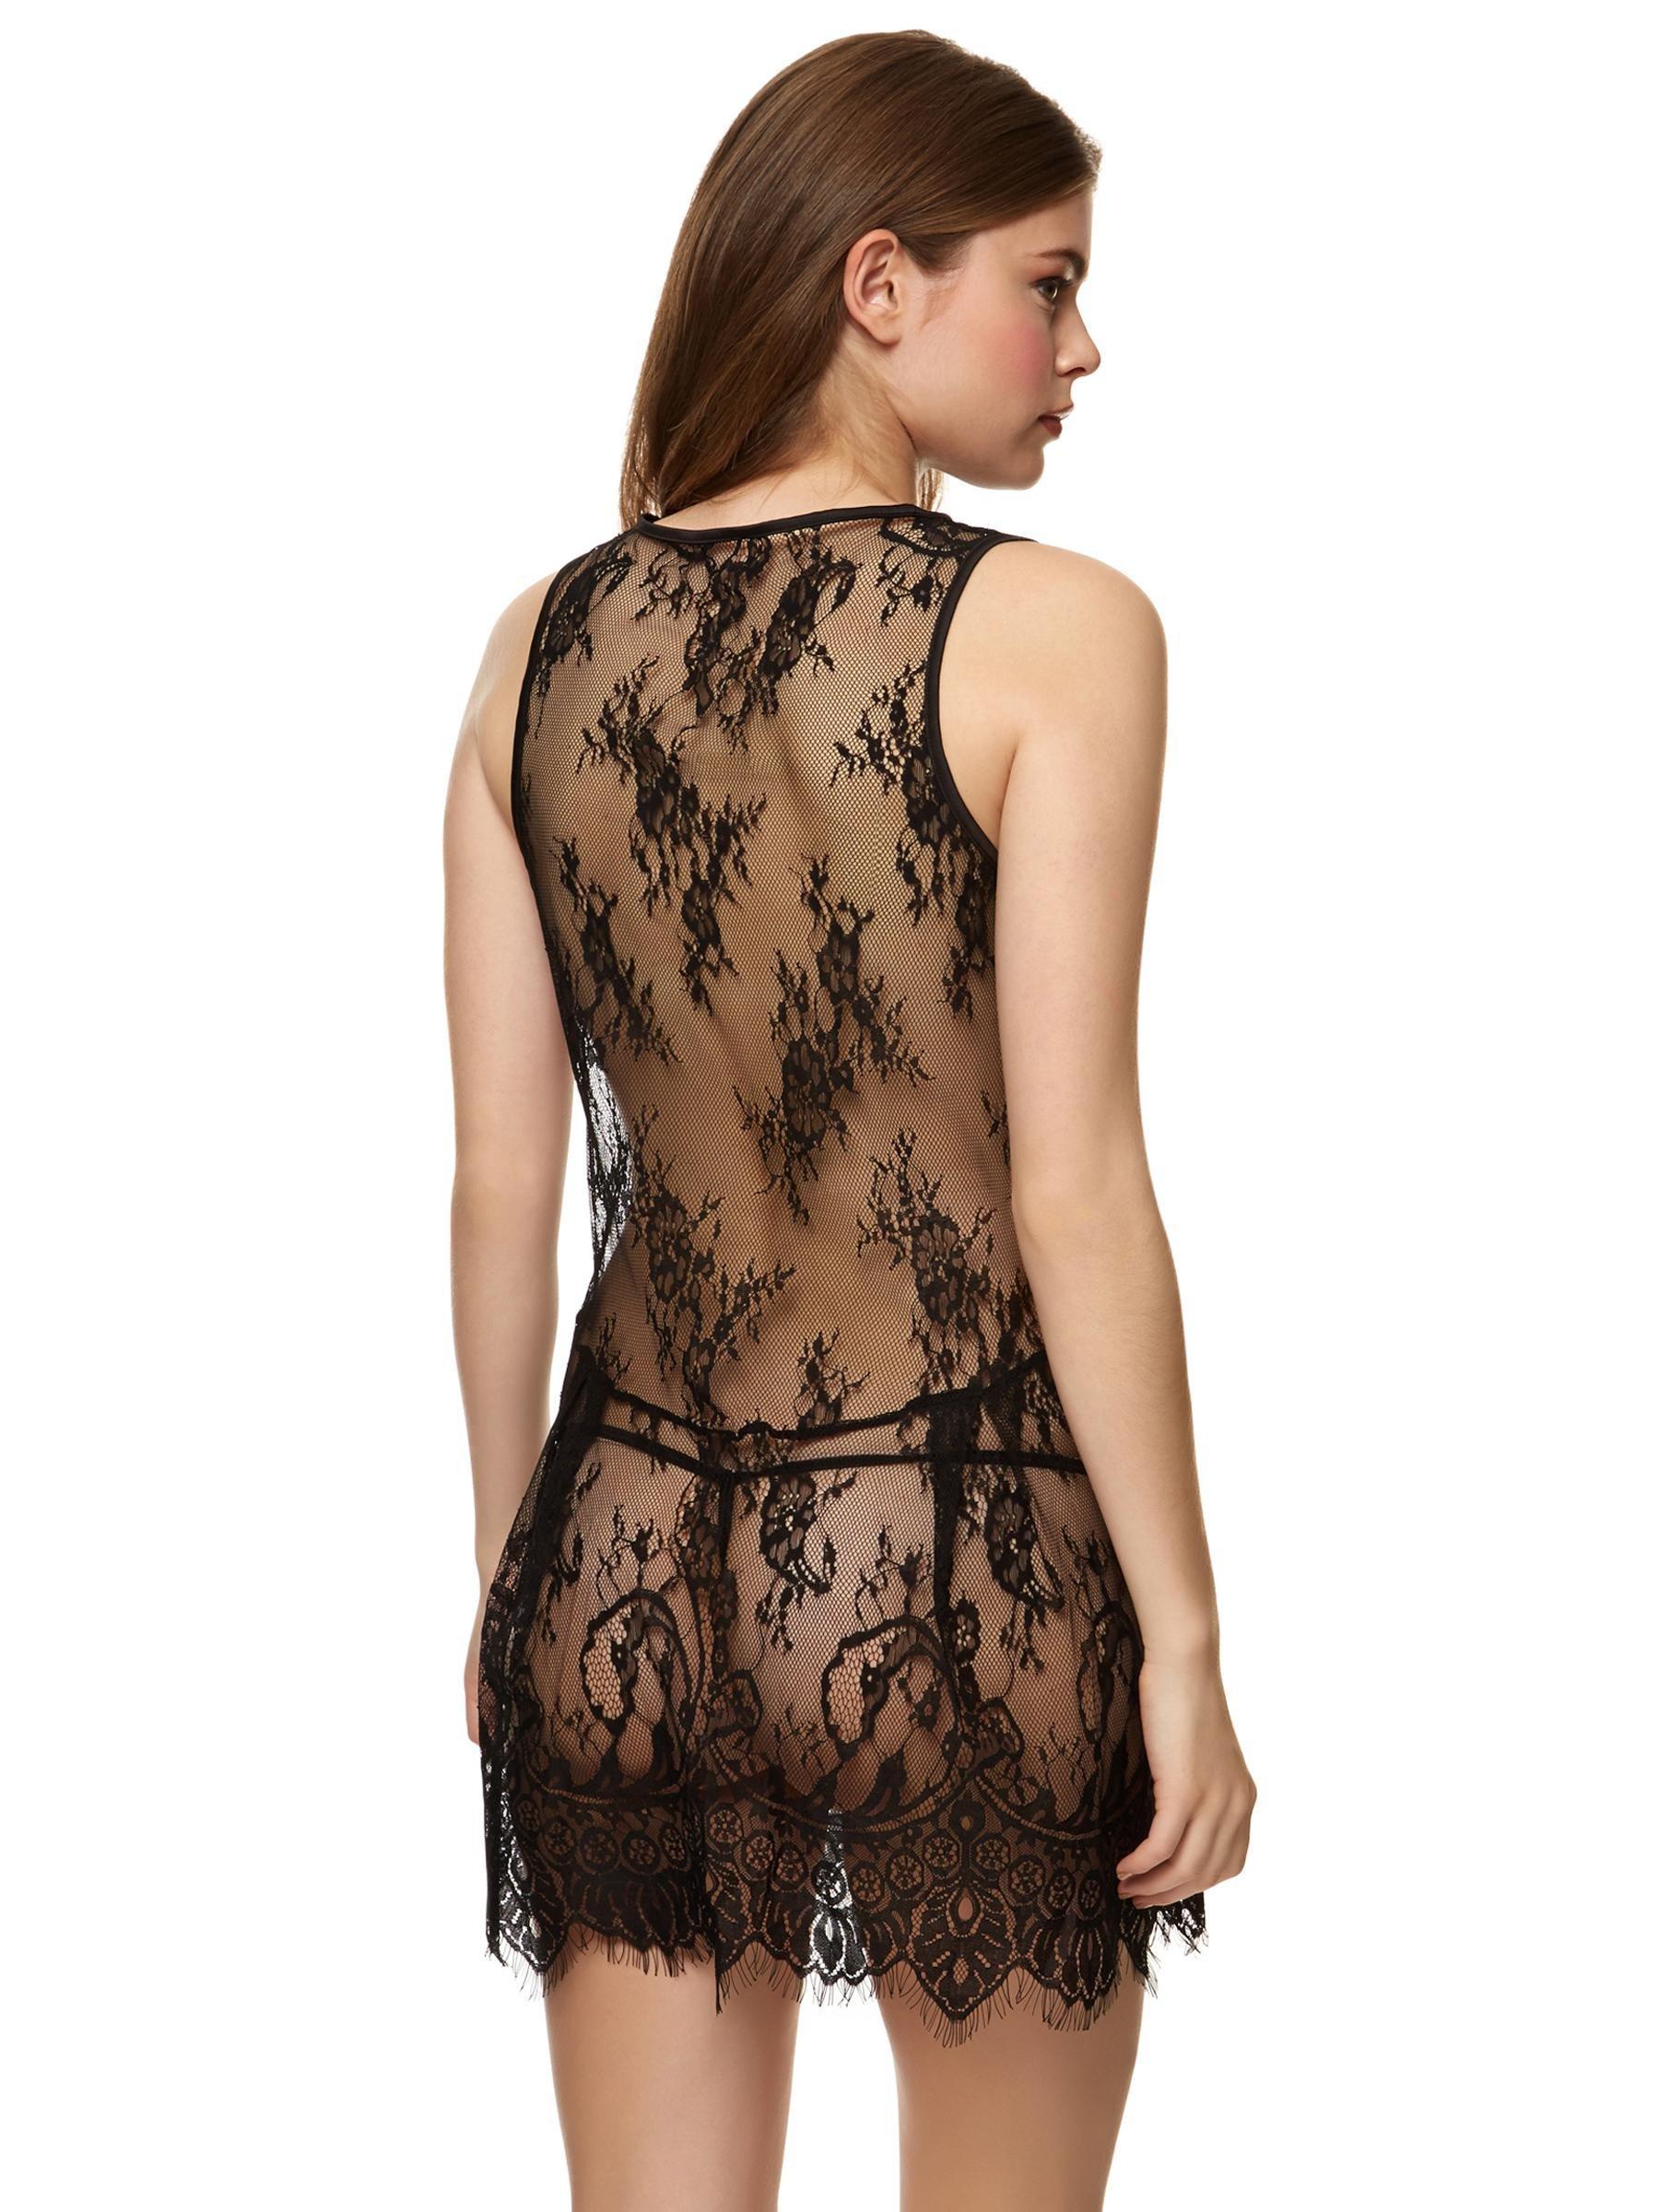 Ann Summers Womens Italia Slip Sexy High Cut Lace Erotic Lingerie ...